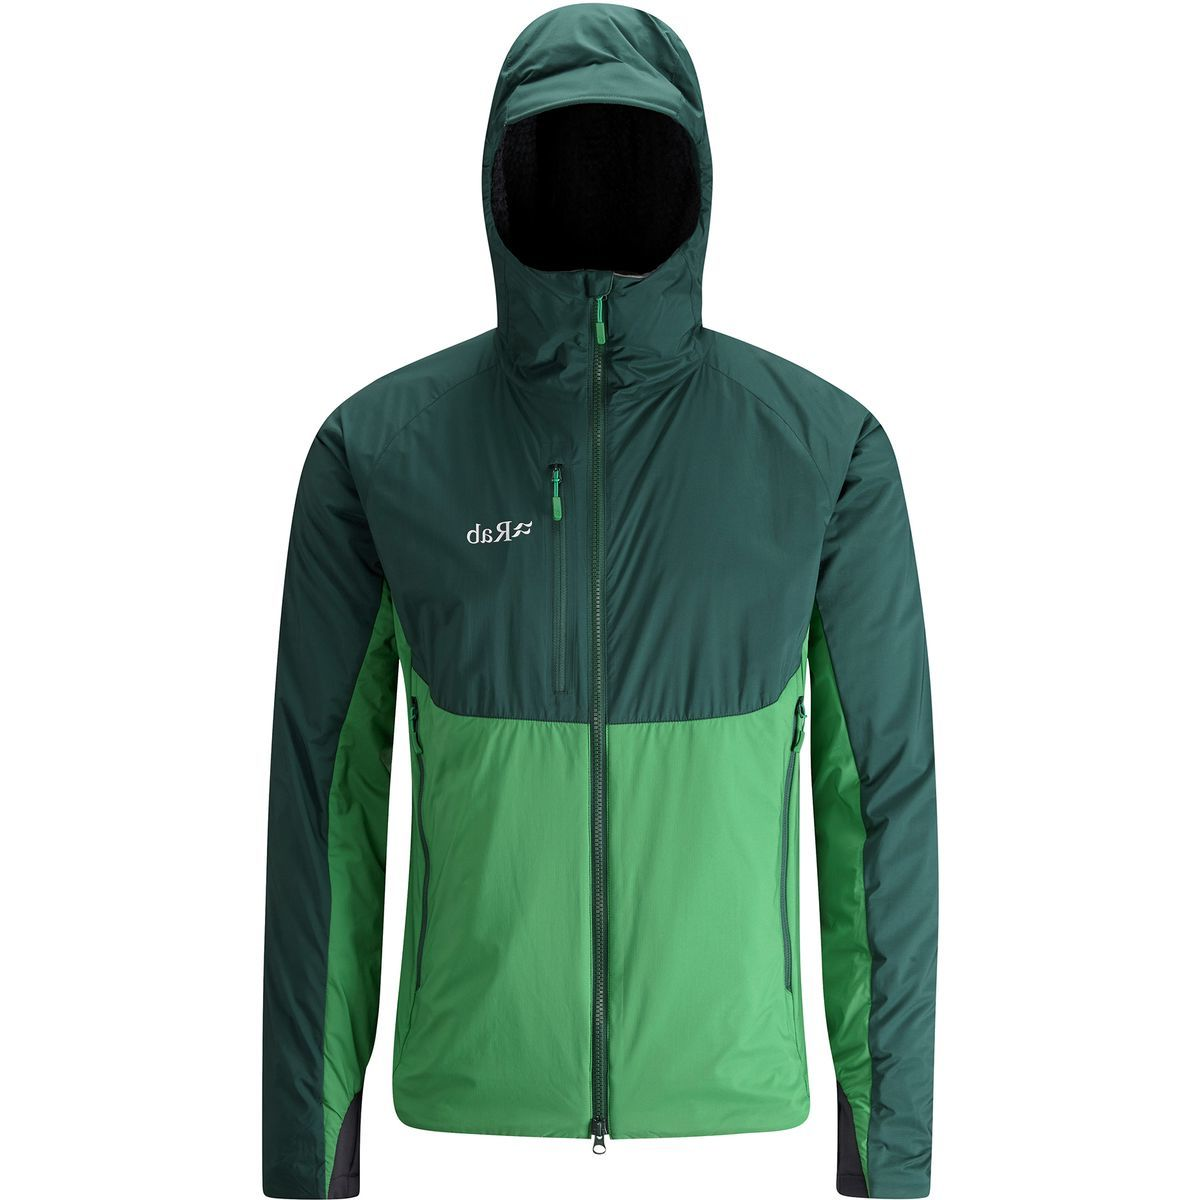 Rab Alpha Direct Jacket - Men's